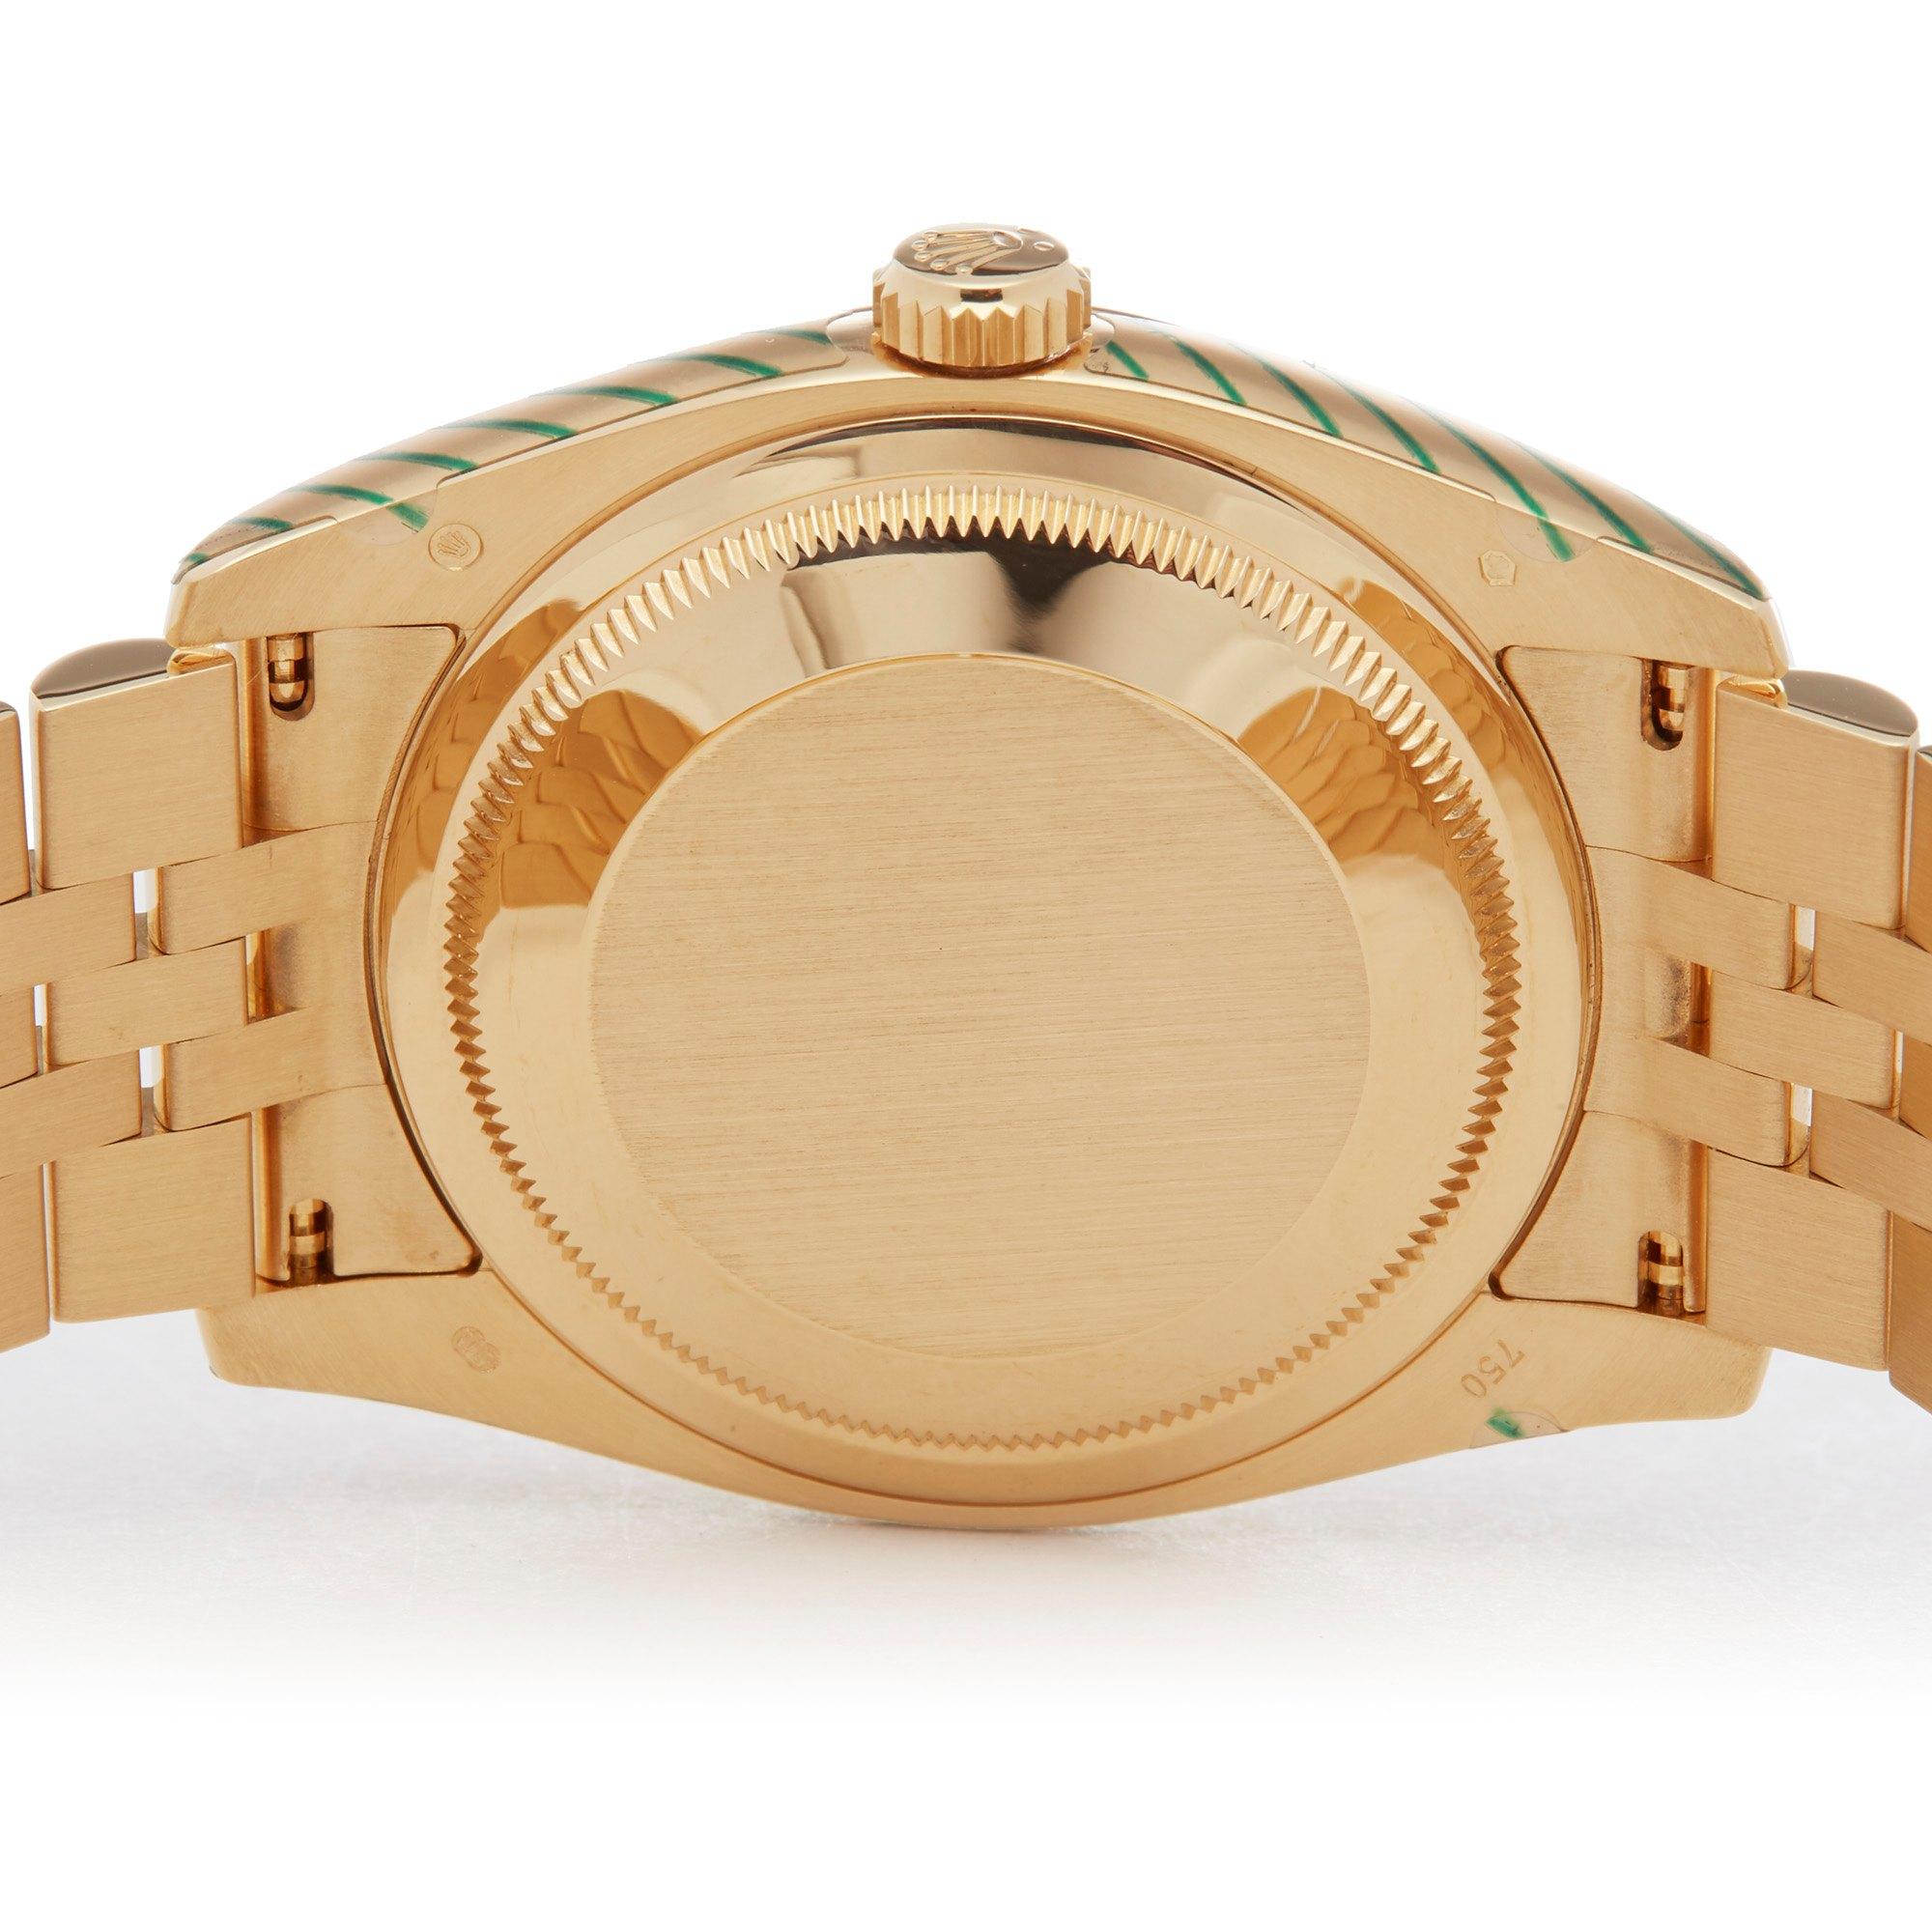 Rolex Datejust 36 Diamond 18K Yellow Gold 116238